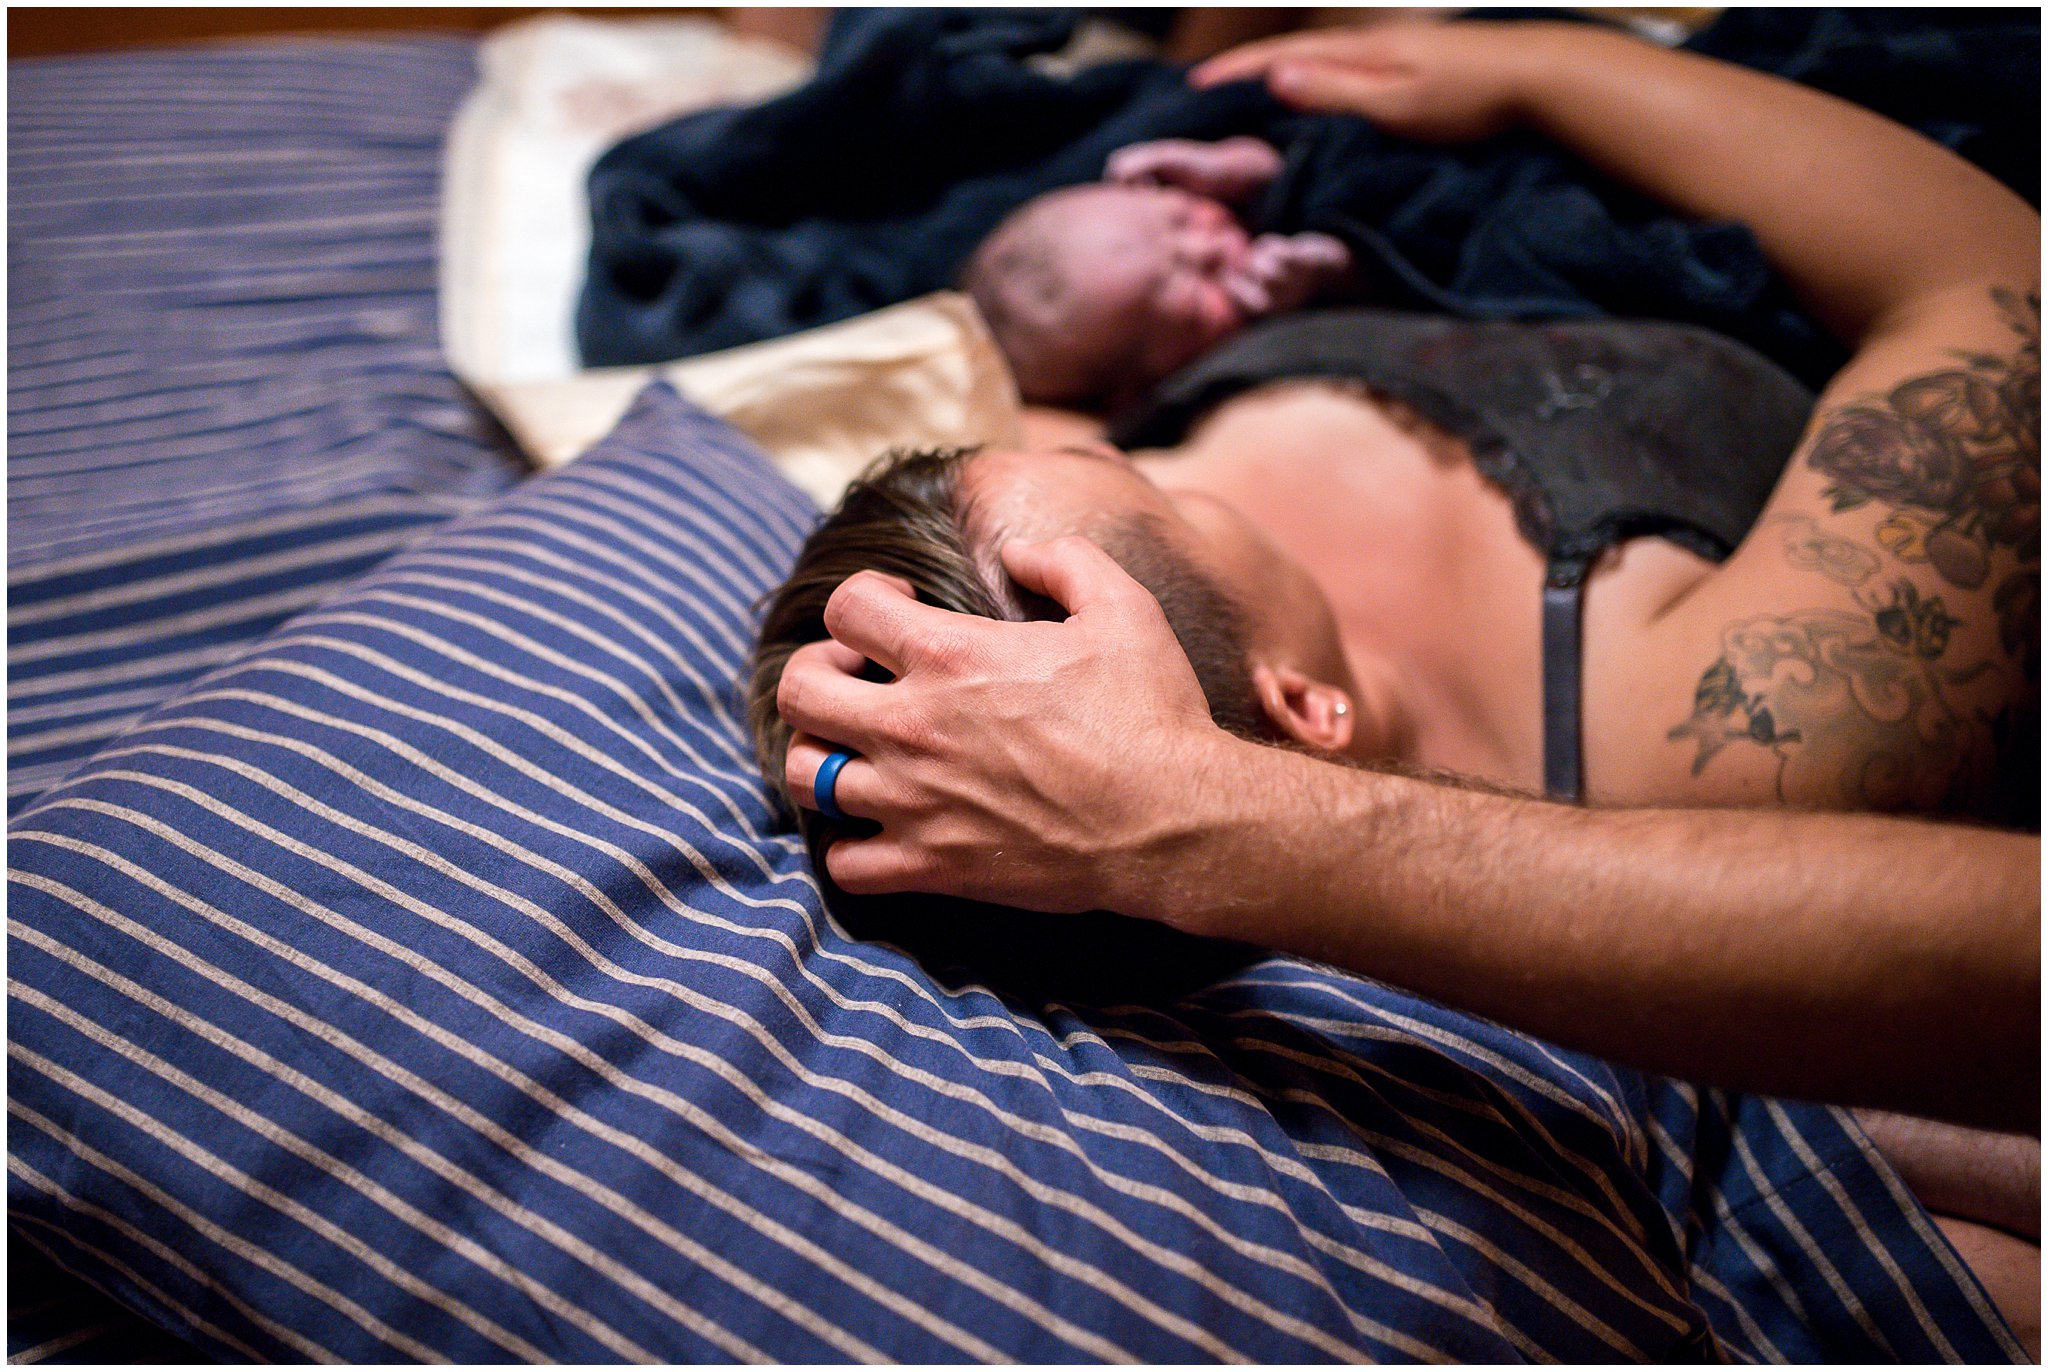 Grand Rapids home birth photographer - Annica Quakenbush - husband stroking wife's hair